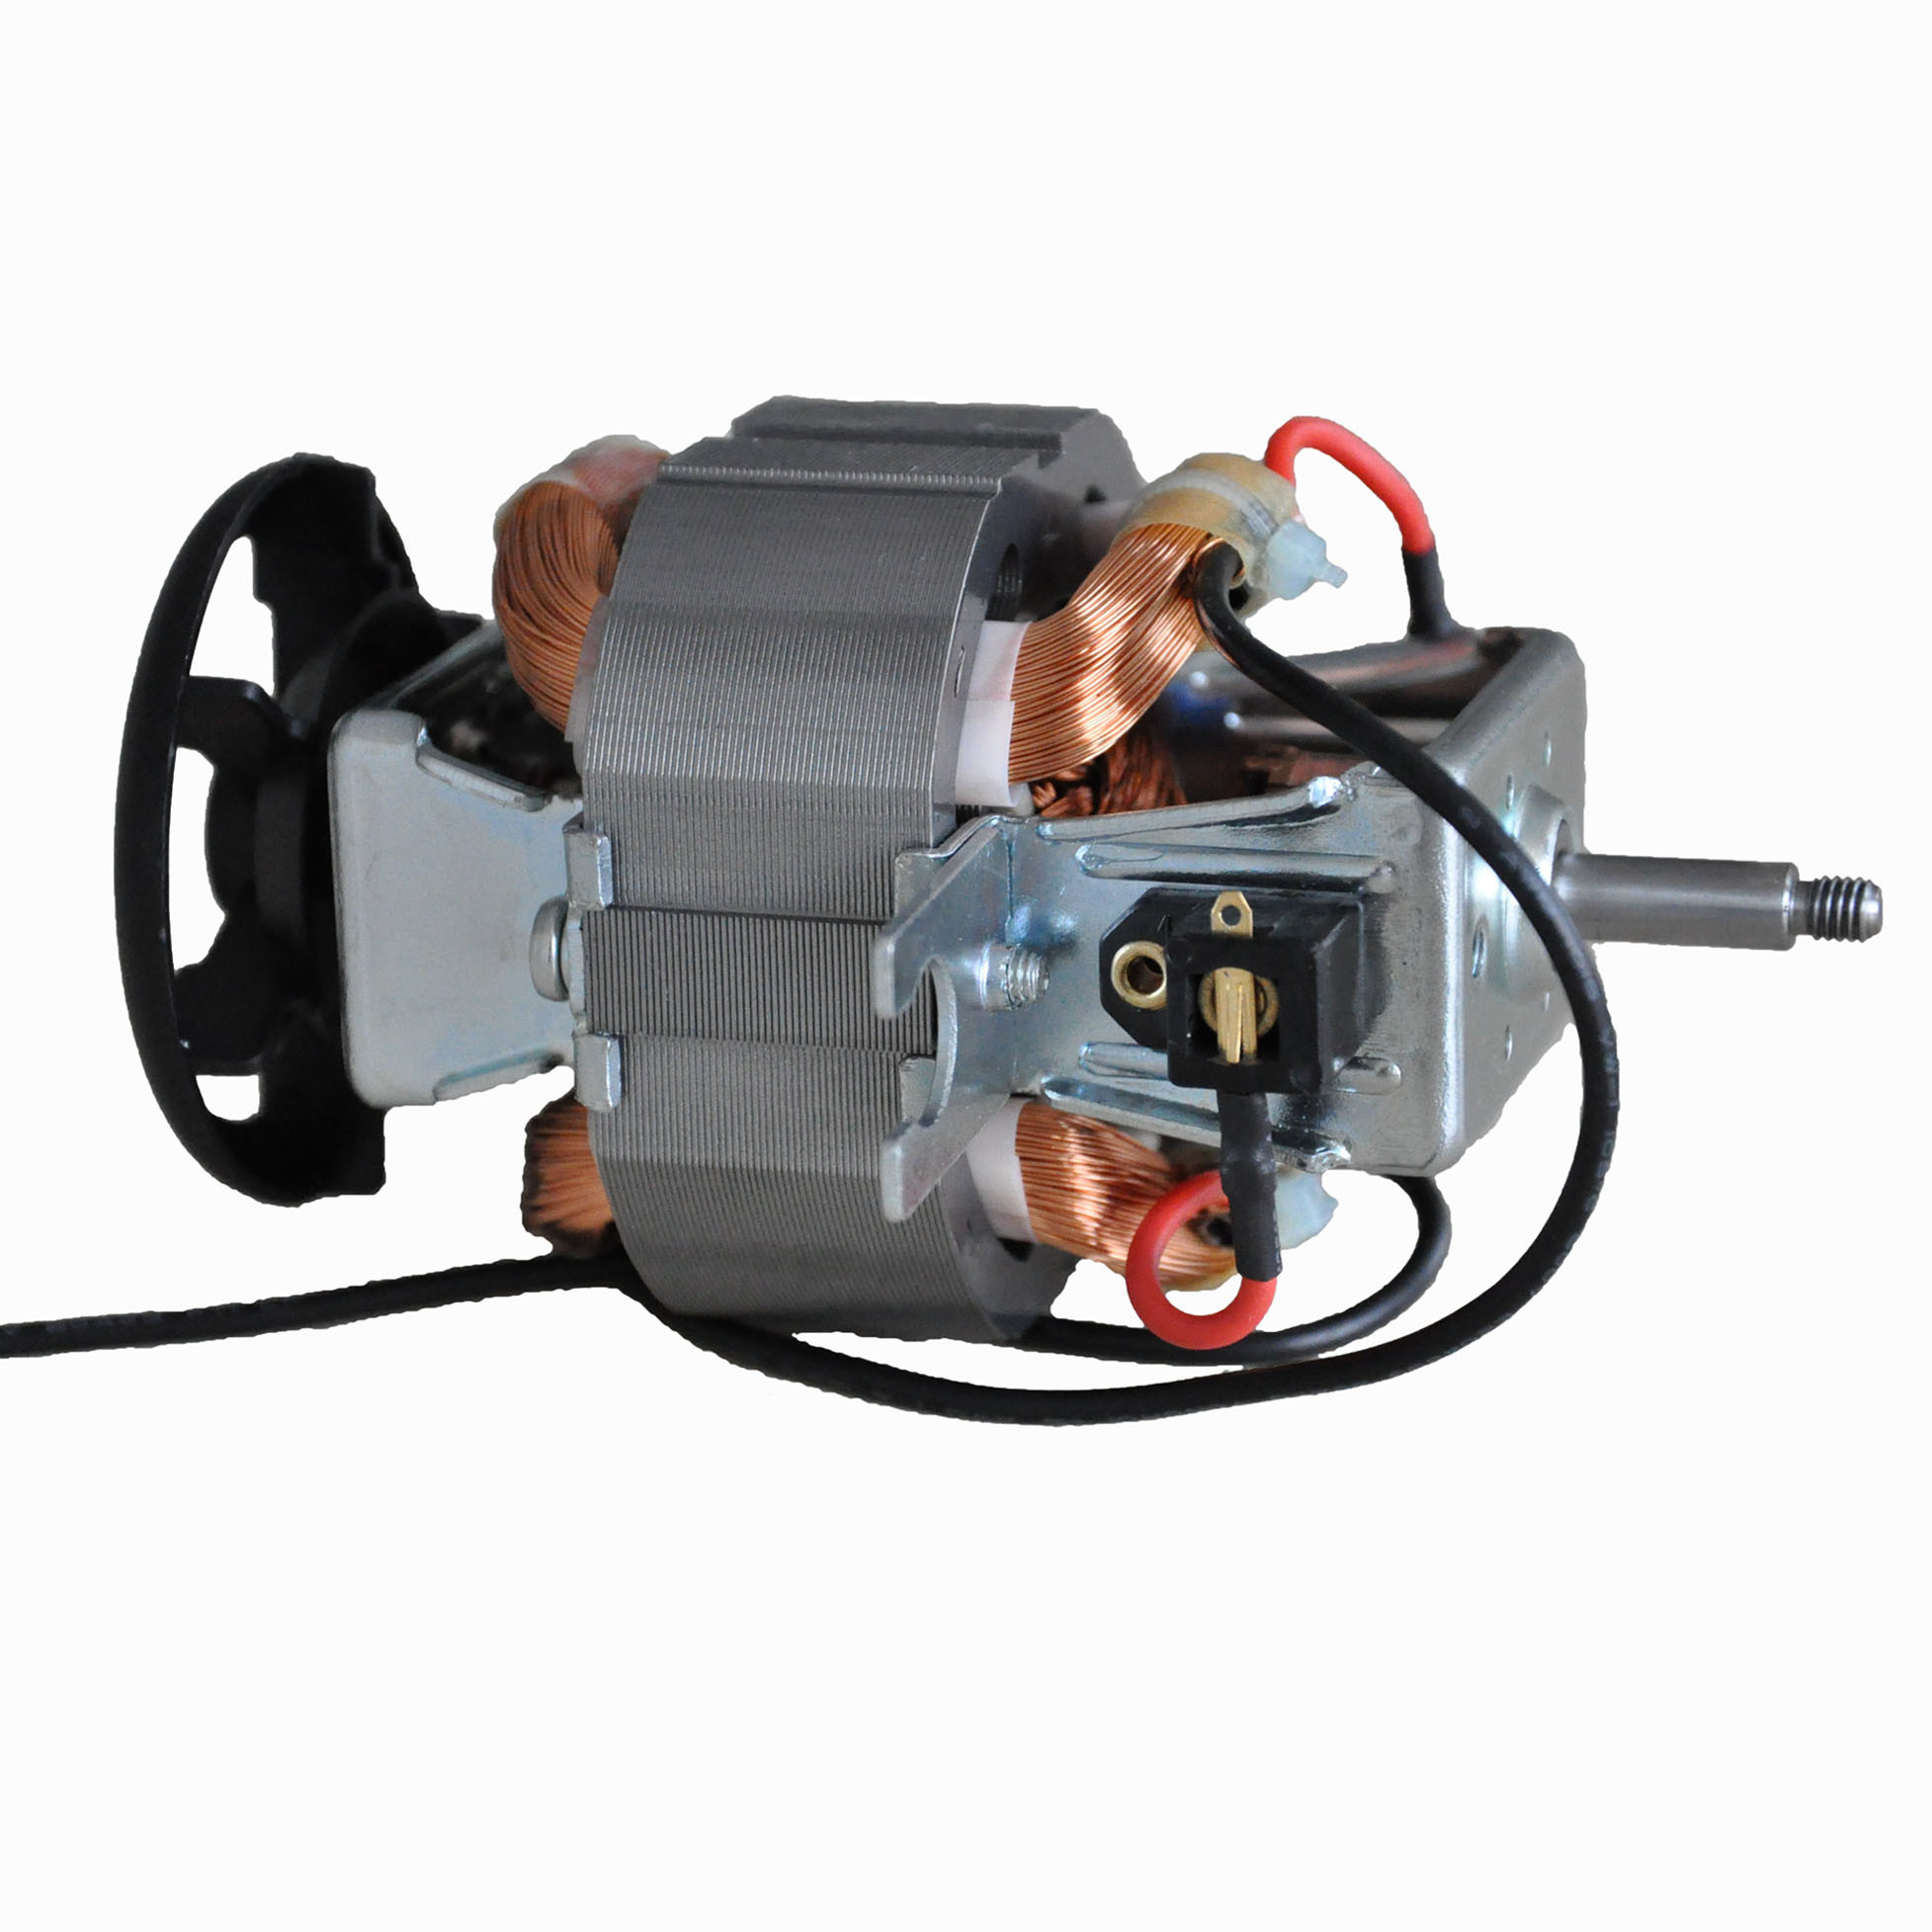 China Mixer Motor Blender Motor Kt7025u230 China